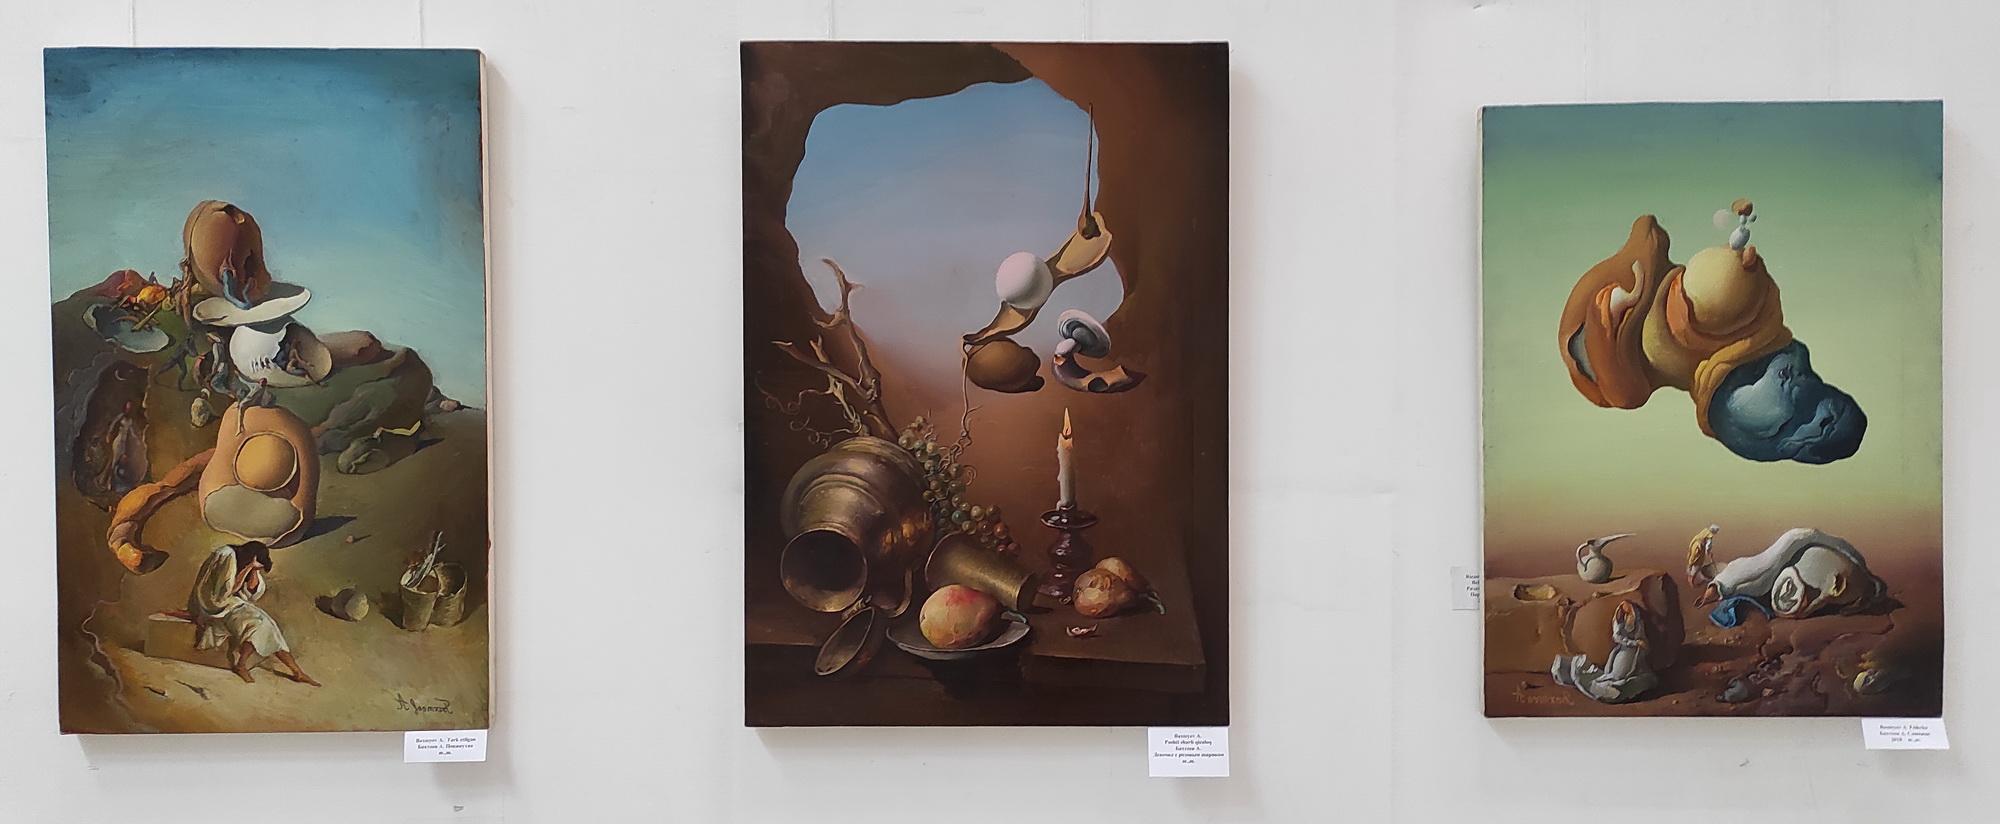 Бахтеев Анвар. Экспозиция картин